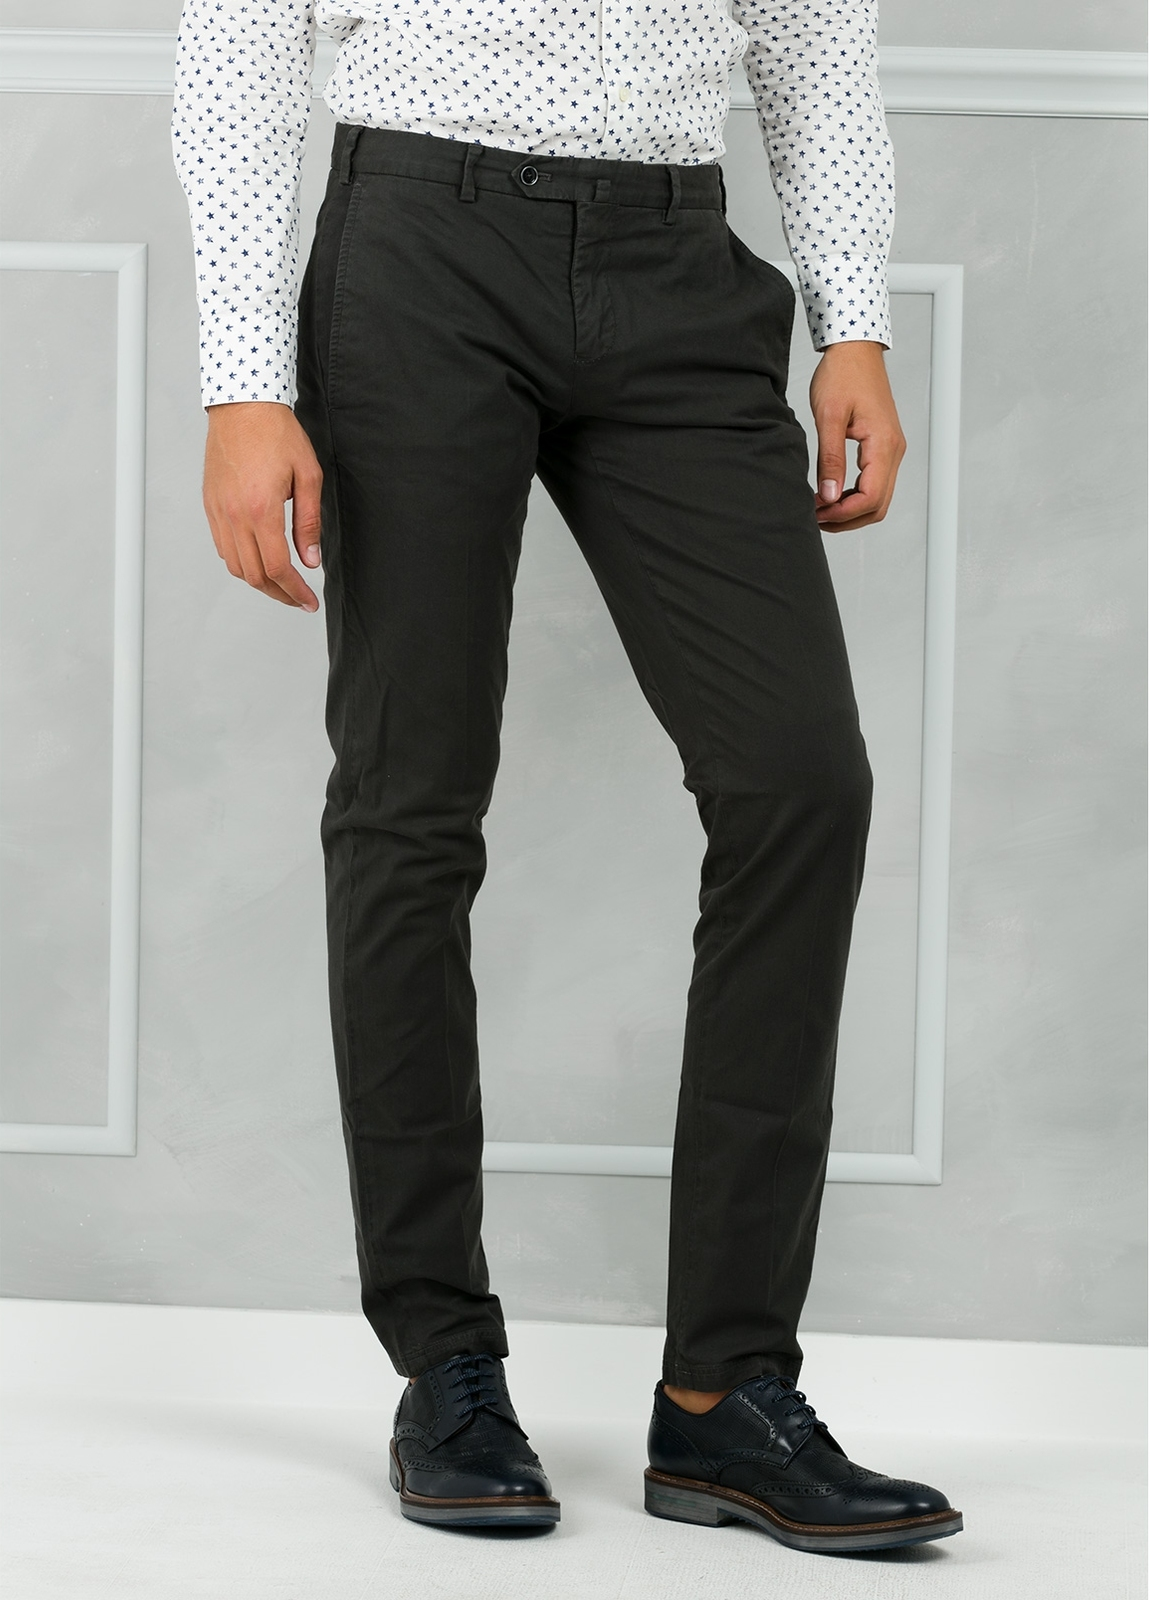 Pantalón chino modelo SANTA color gris. 98% Algodón 2% Elastán. - Ítem1